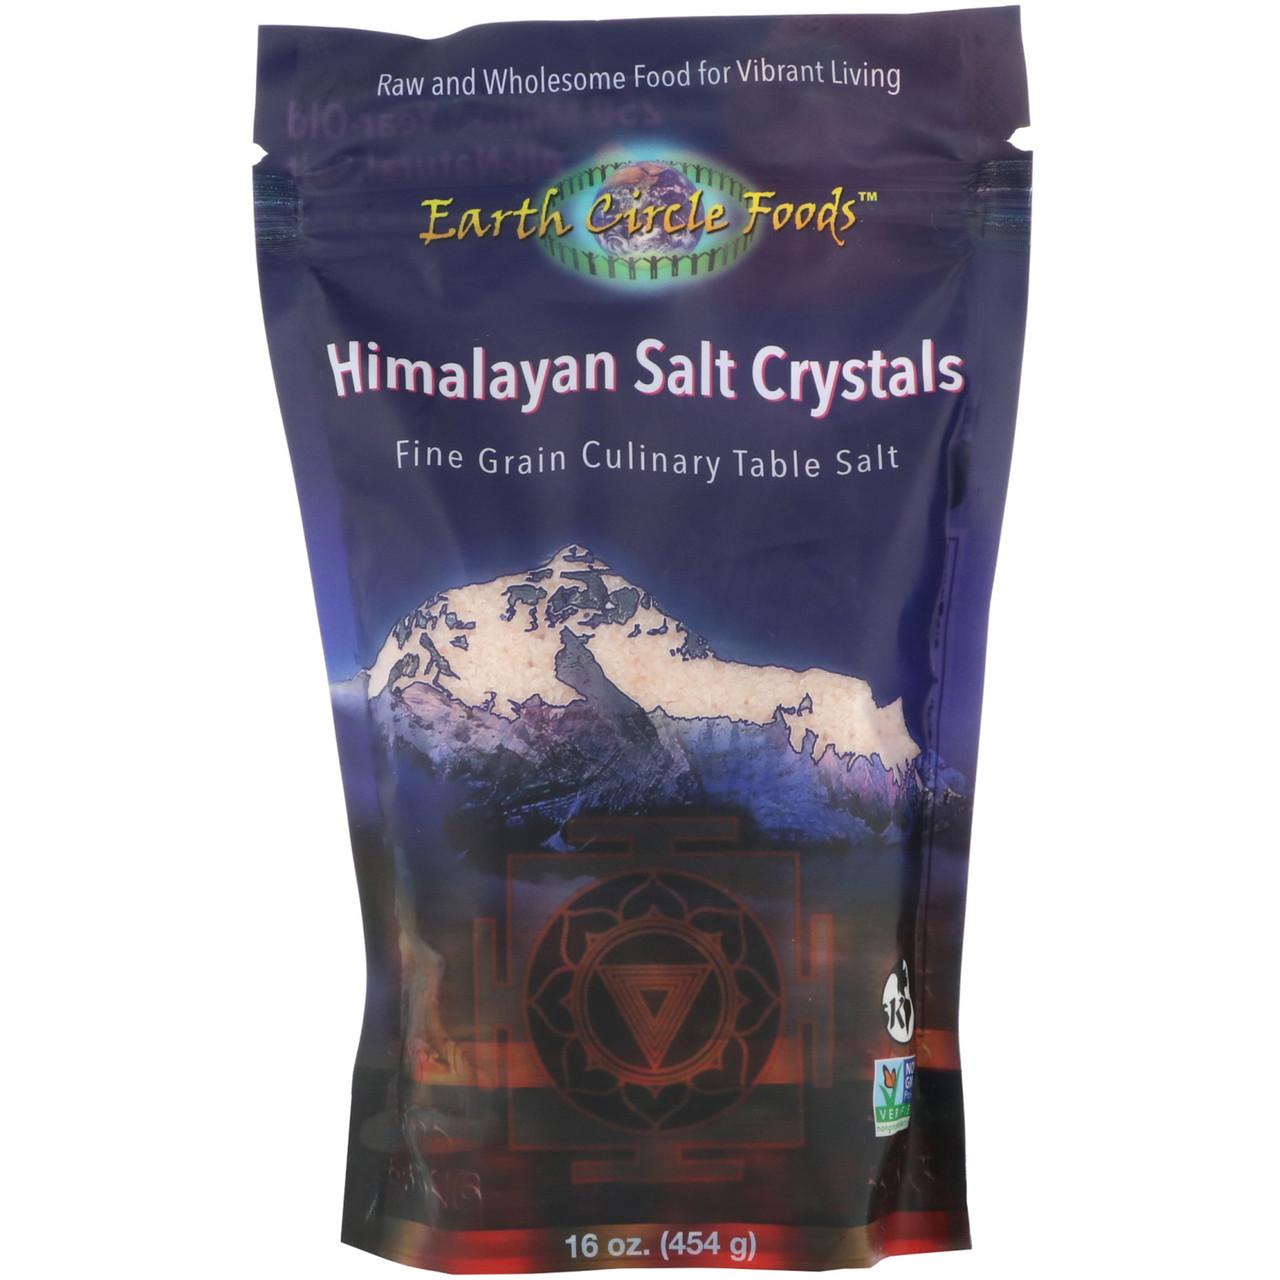 Earth Circle Organics, Himalayan Salt Crystals, Fine Grain, 16 oz (454 g)